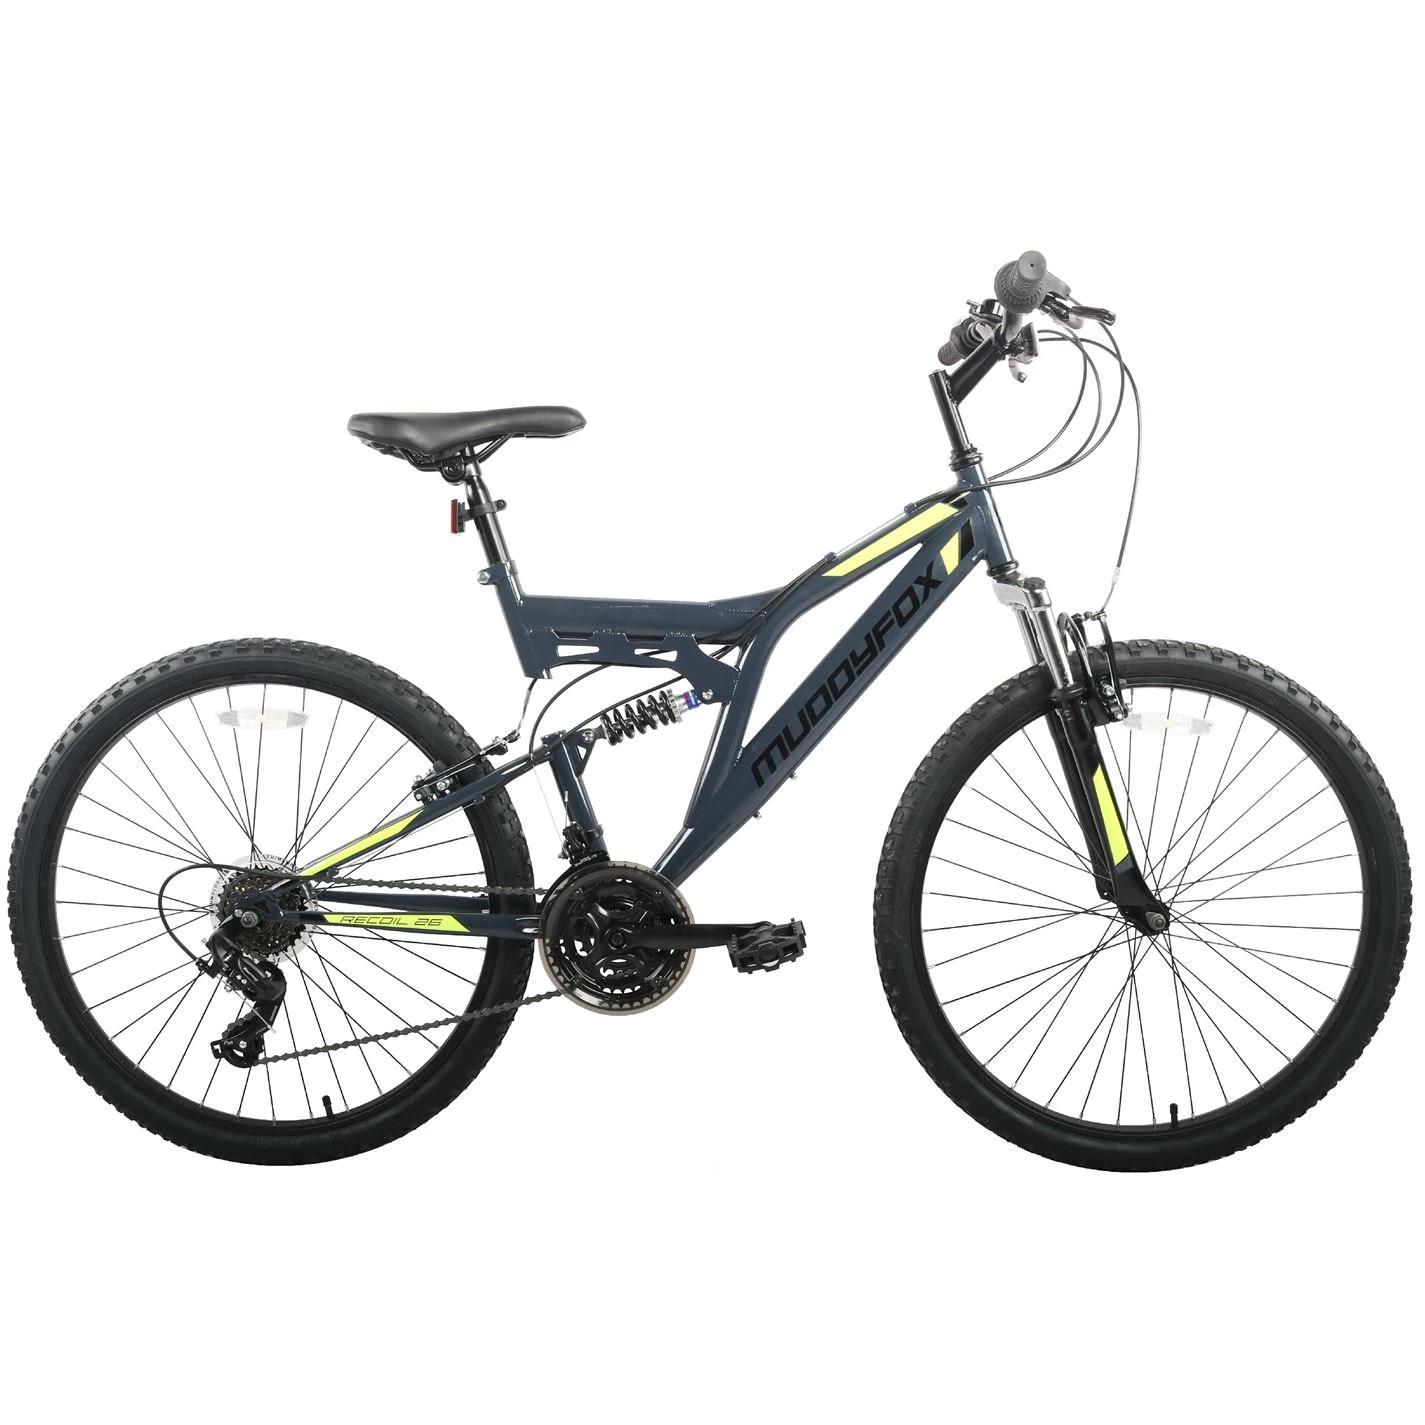 MuddyFox Recoil 26 Men's Bike £158.99 delivered @ Sports Direct